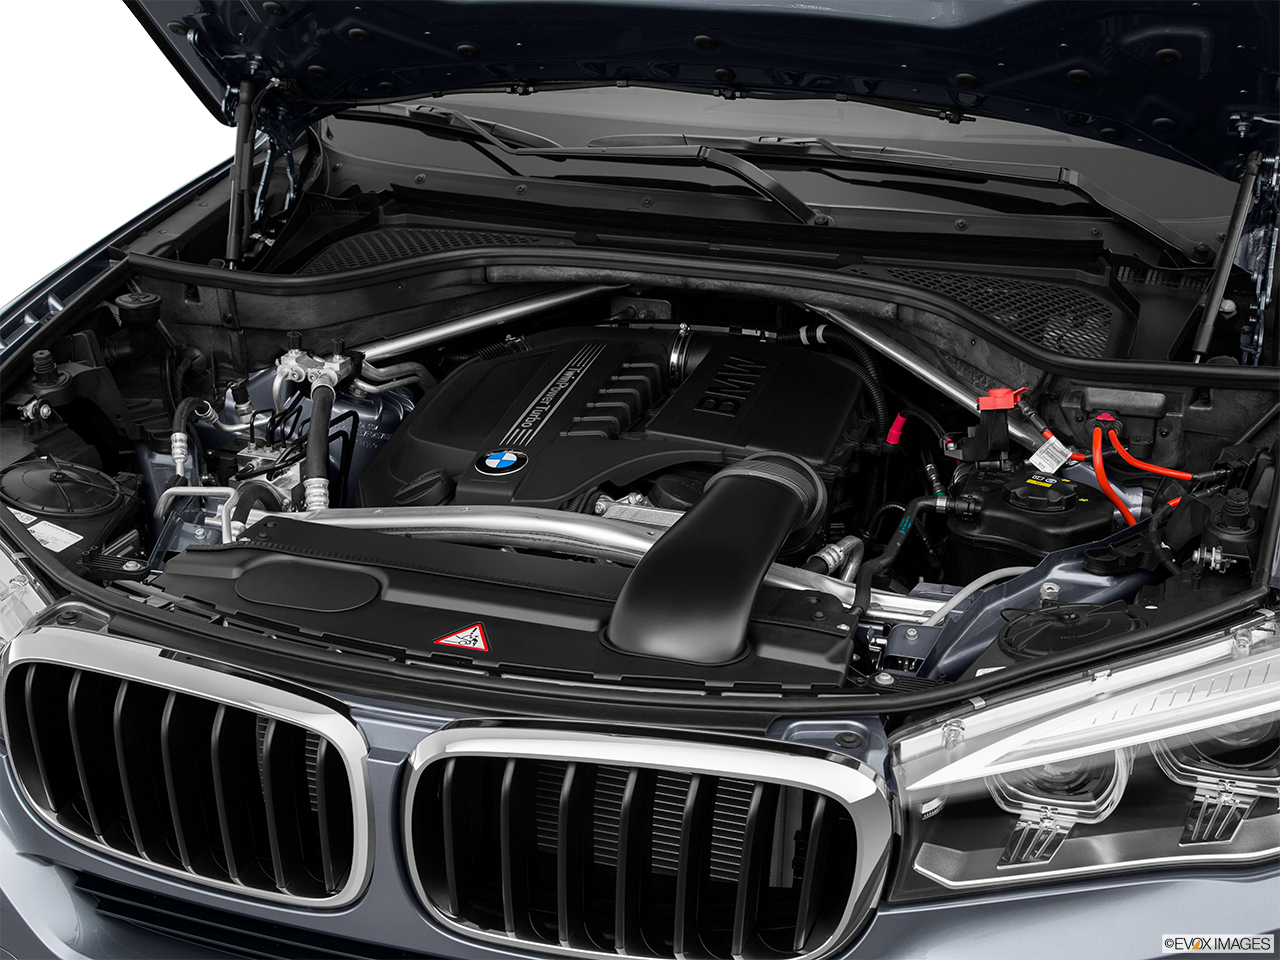 2015 Bmw X5 4 Door Xdrive35i Engine